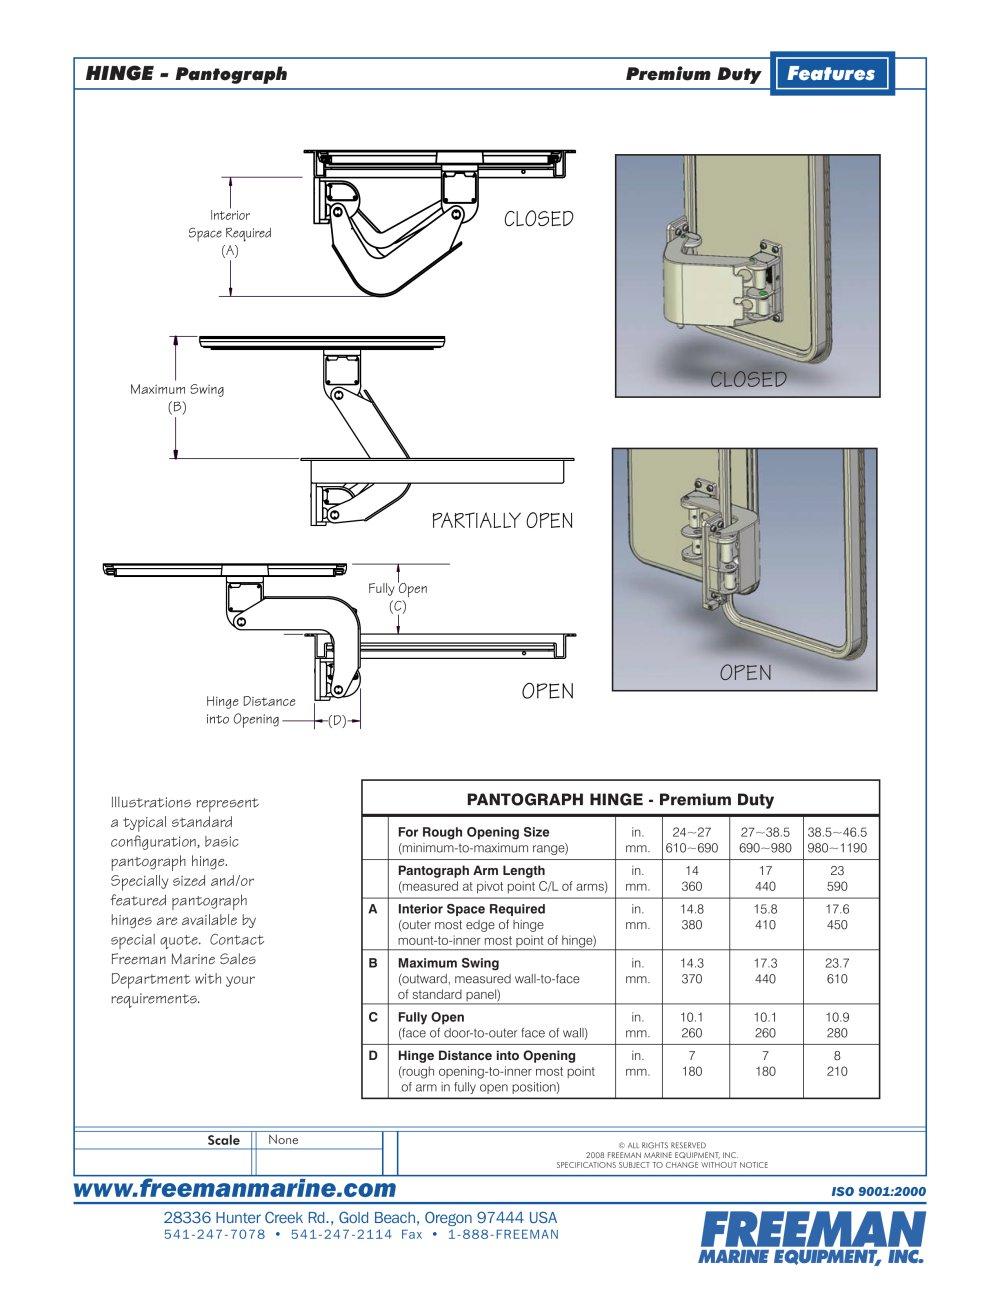 Pantograph Hinge - 1 / 6 Pages  sc 1 st  Catalogues Nauticexpo & Pantograph Hinge - Freeman Marine Equipment - PDF Catalogues ...